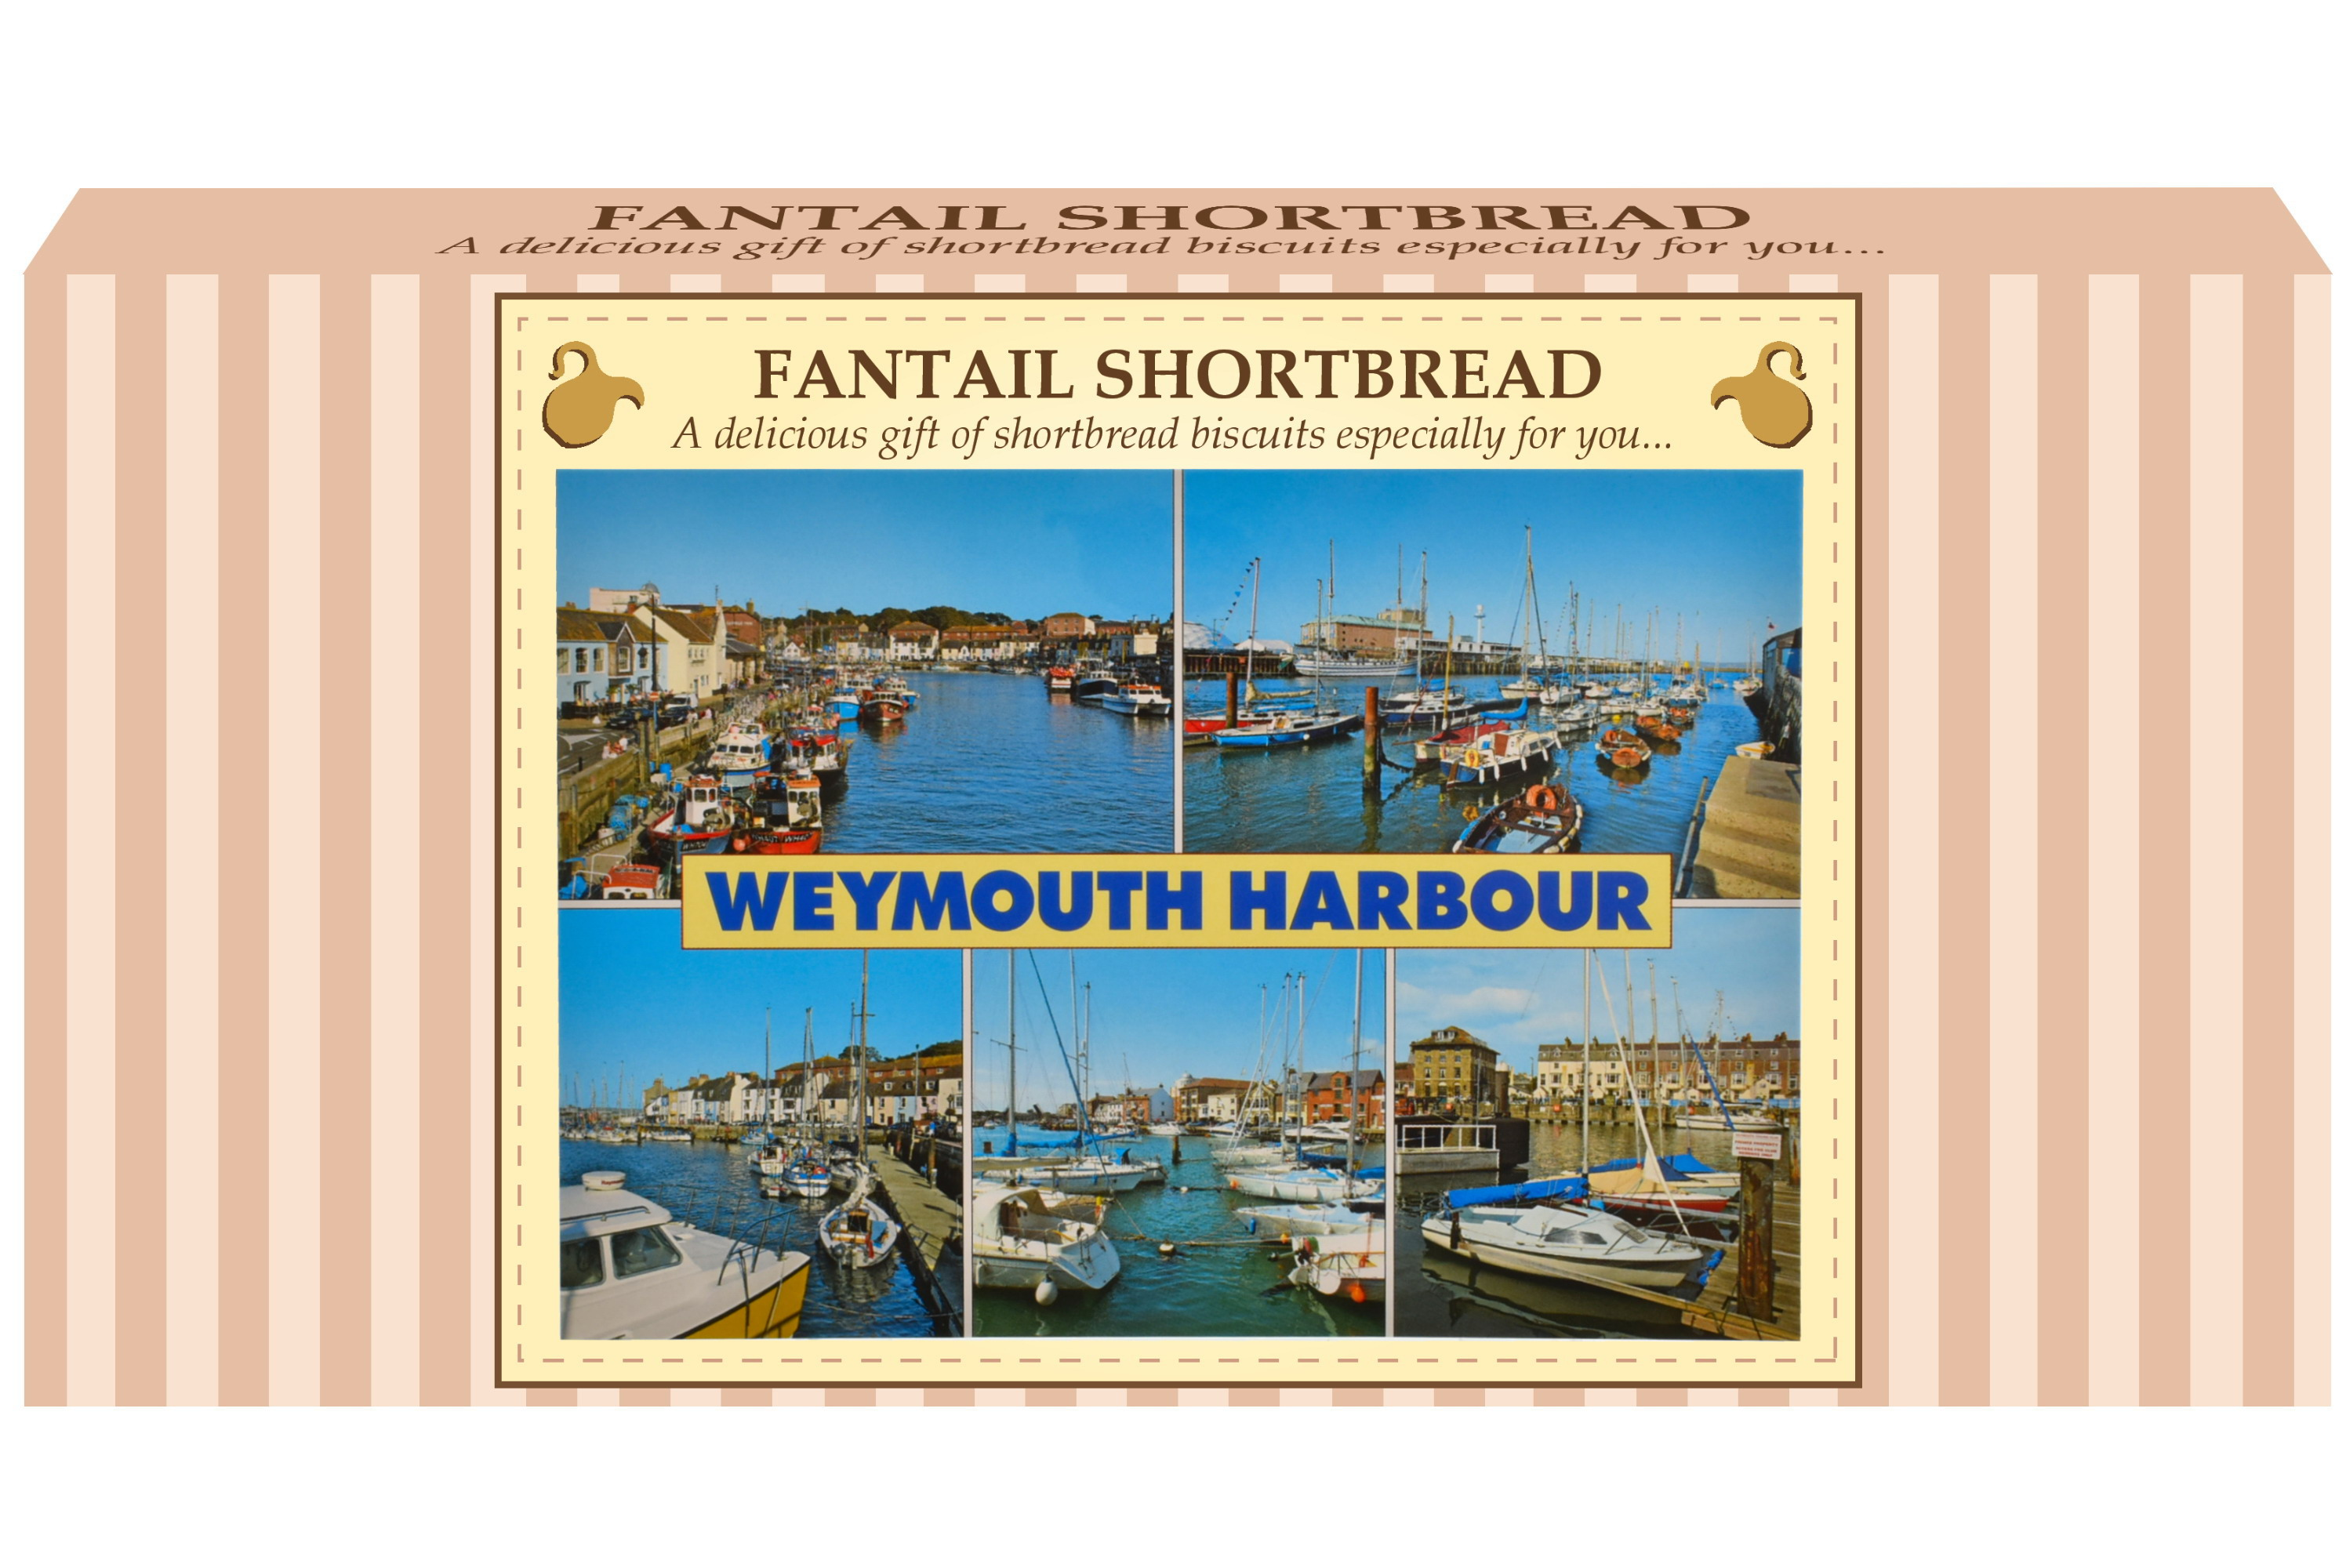 250g Fantail Shortbread & Postcard Gift Box